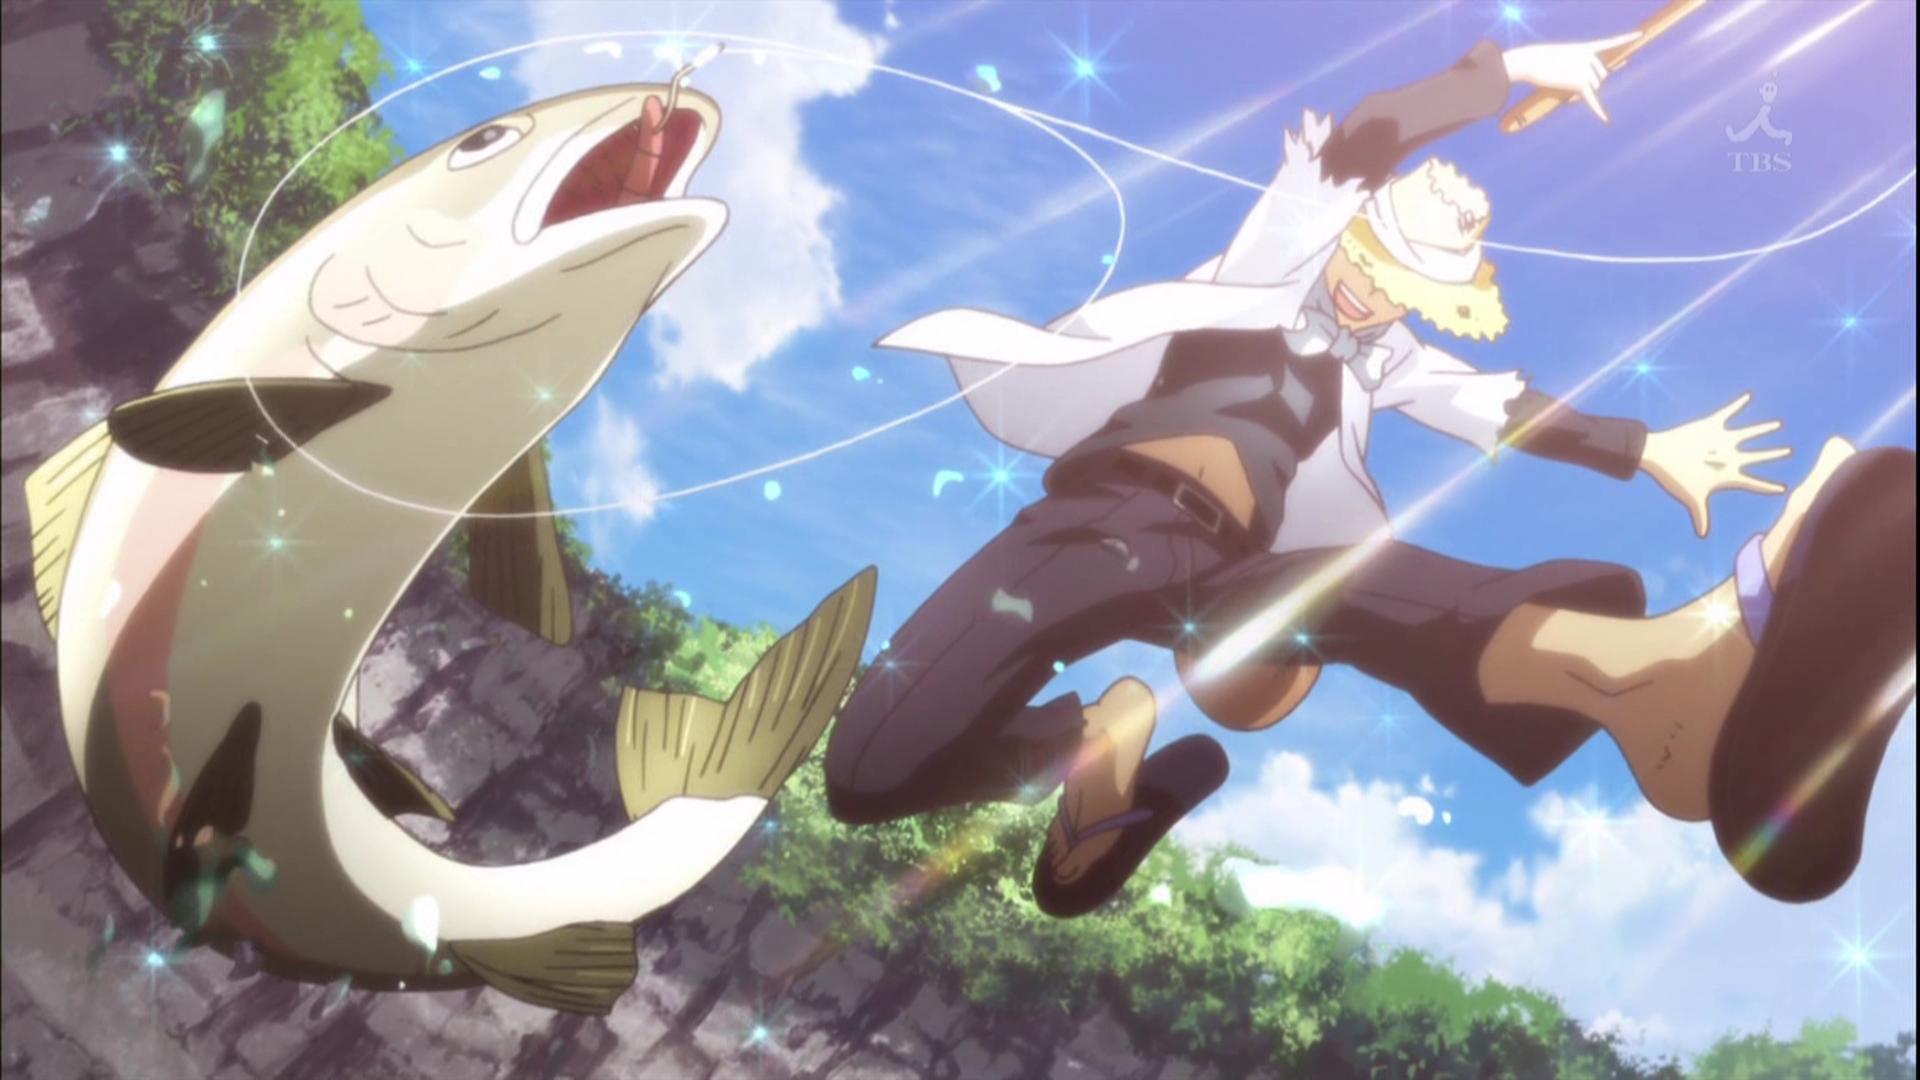 Angel Beats 第7話 Alive 不安を呼び込む美しき風景 アニメ元